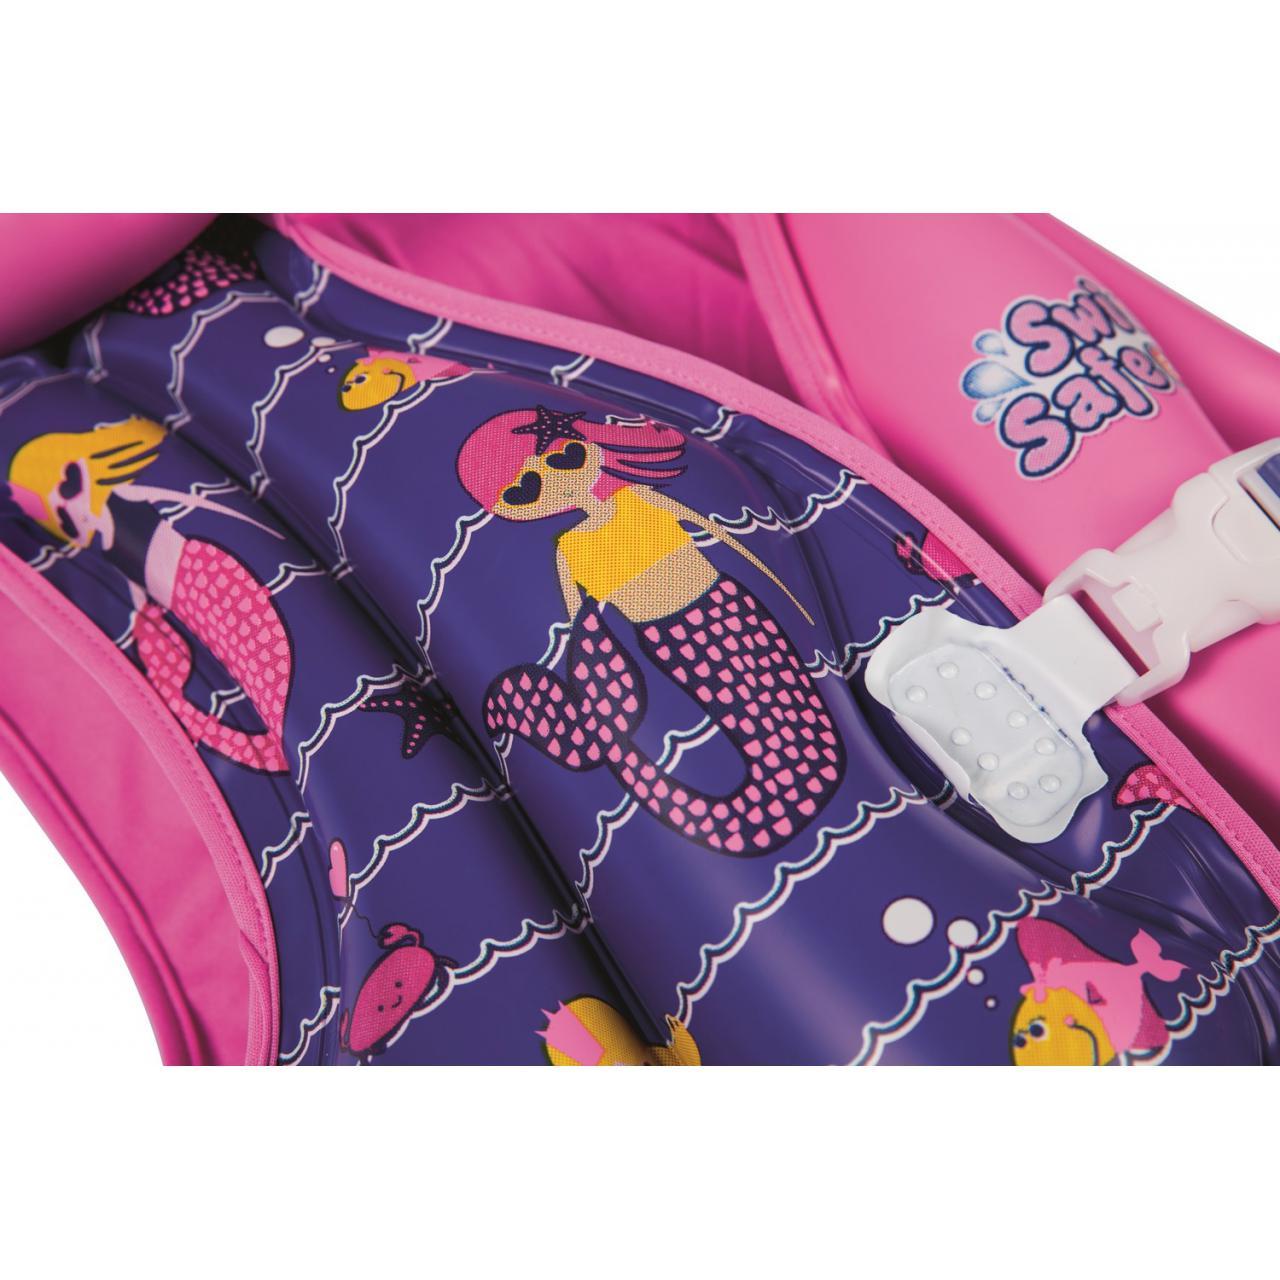 Gilet-flottant-natation-Bestway-Girl-inflatable-3-6-ans-Rose-70799-Neuf miniature 2